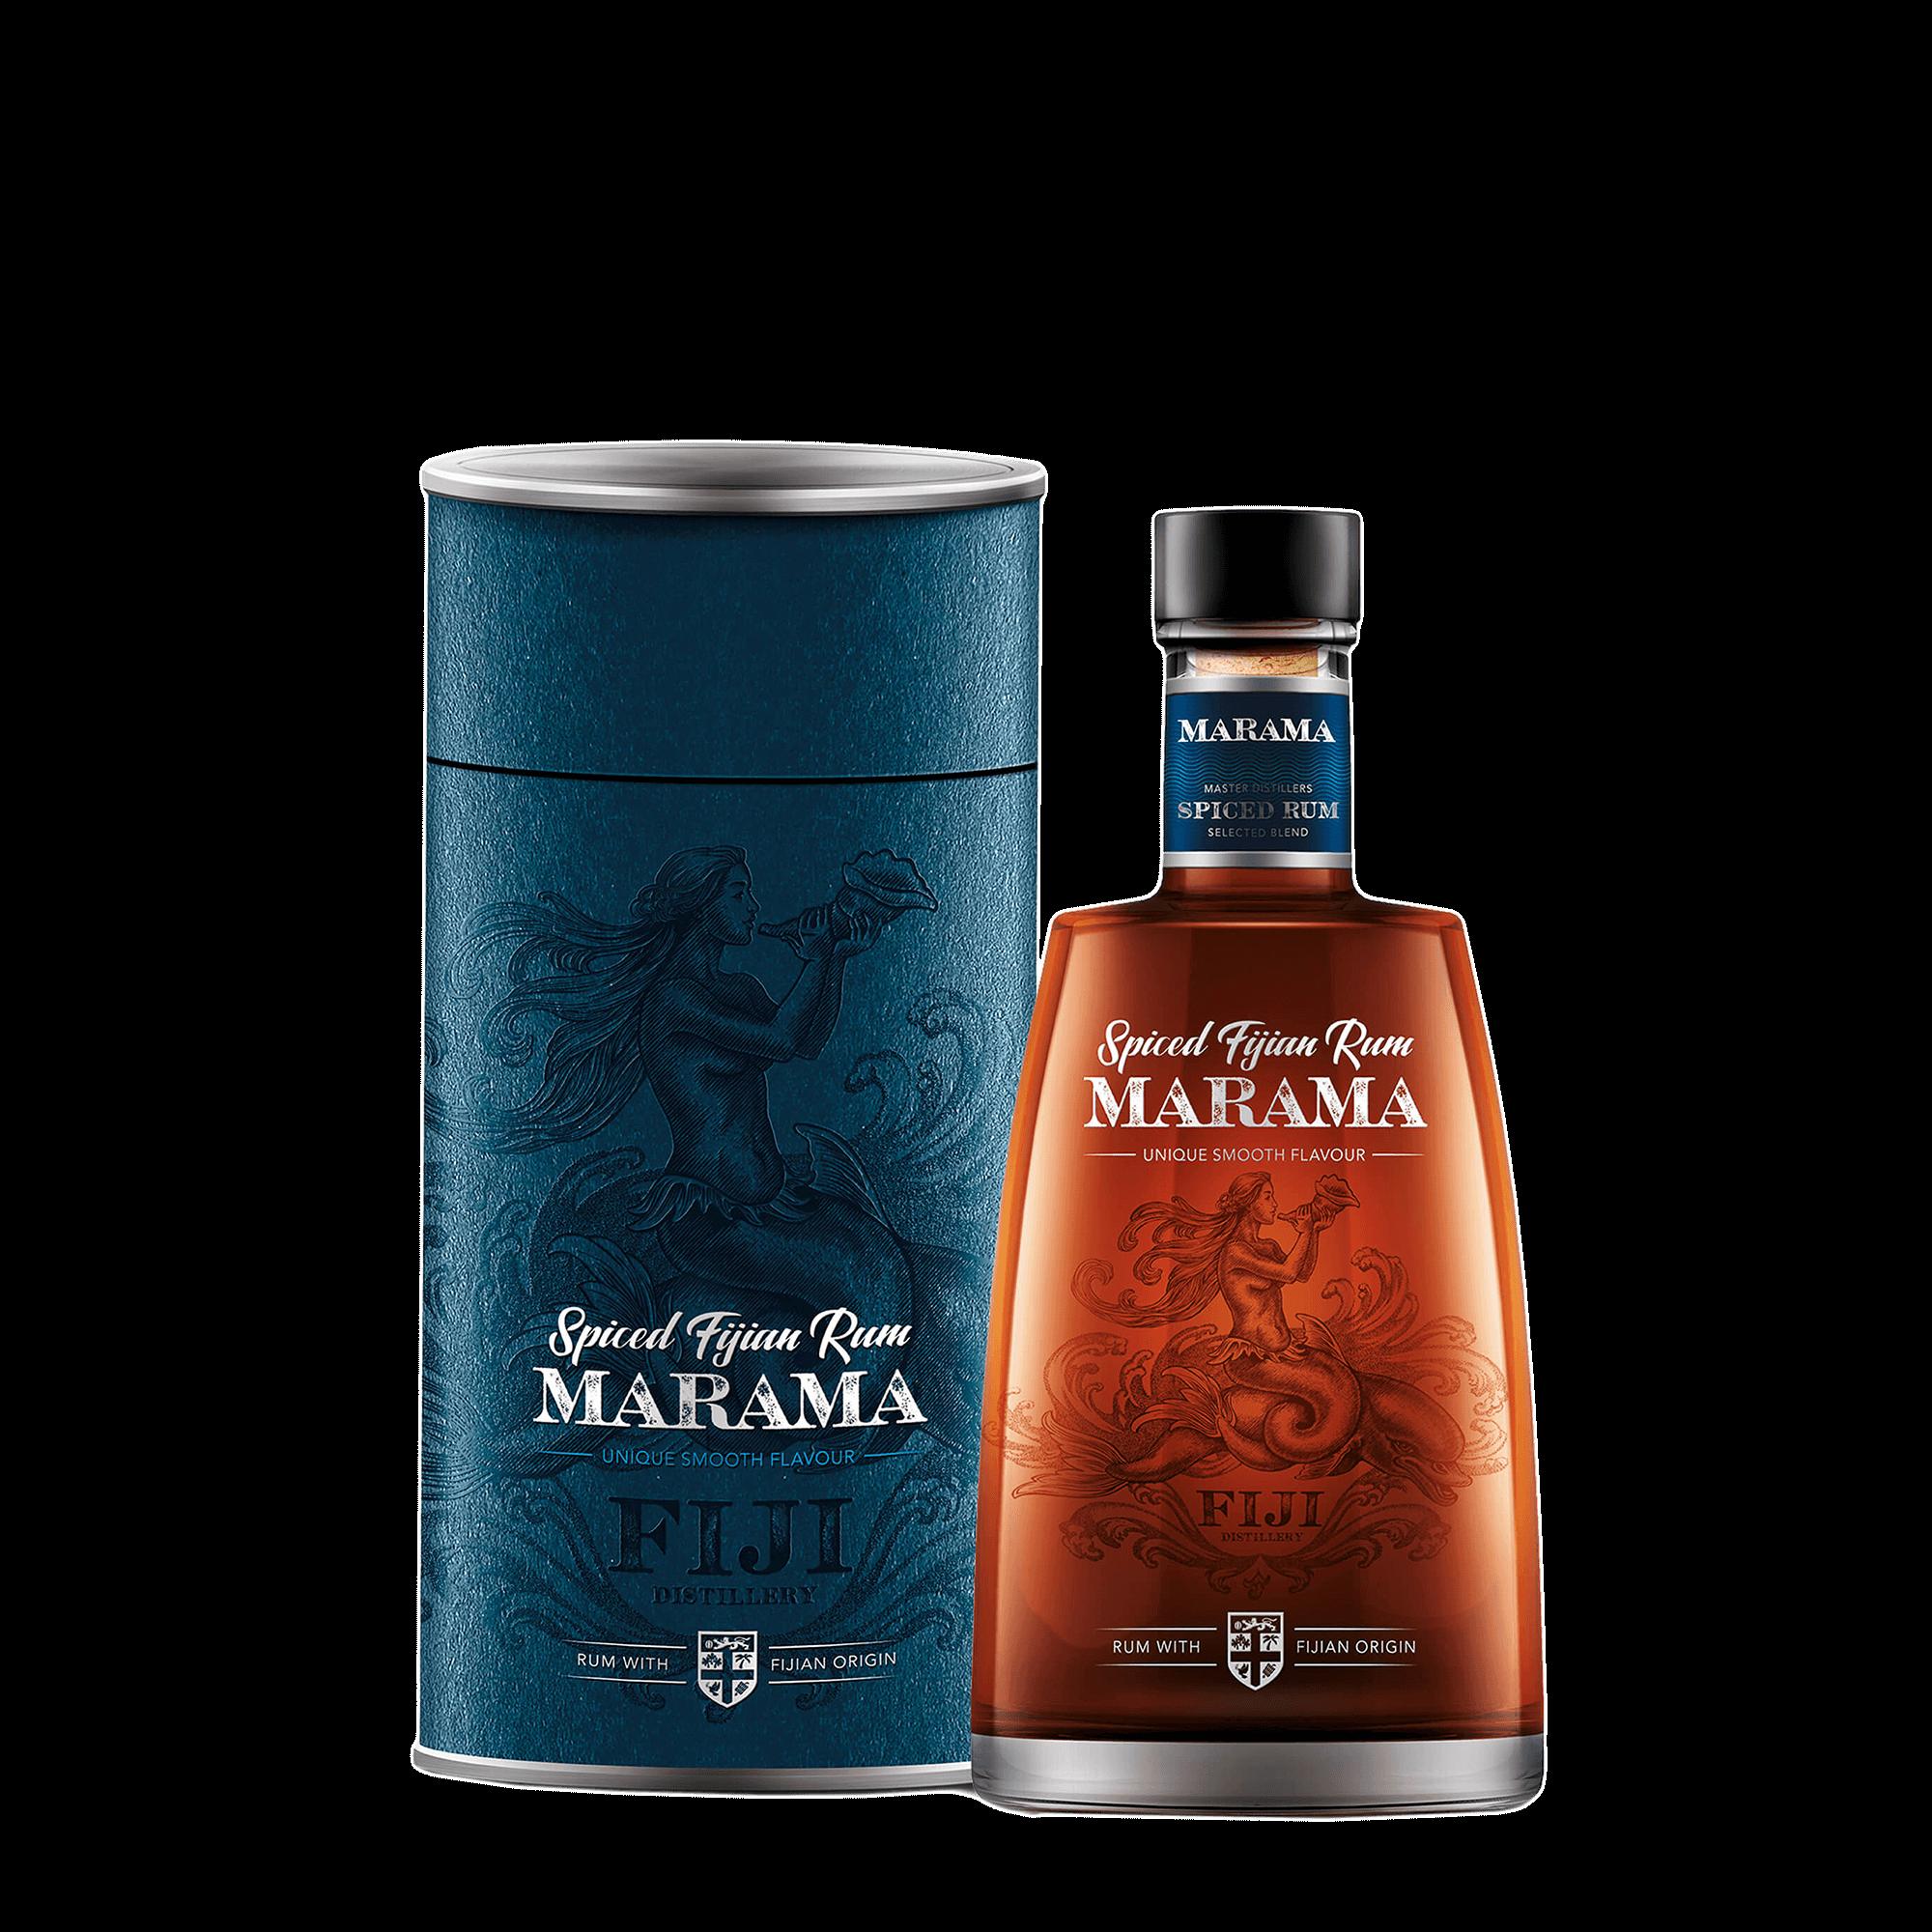 Marama Spiced Rum 0,7l in Geschenkverpackung